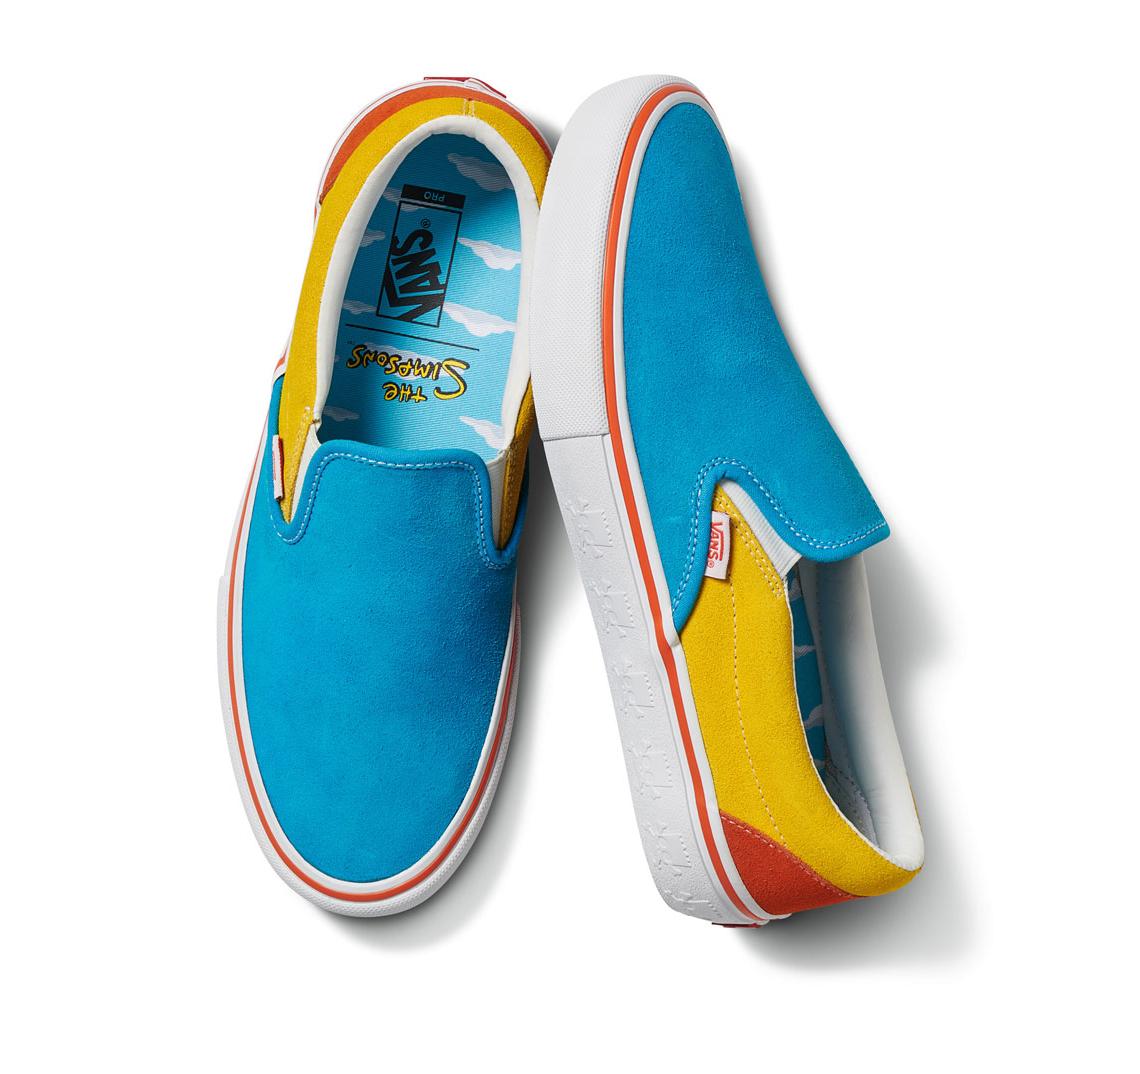 The Simpsons x Vans Launch